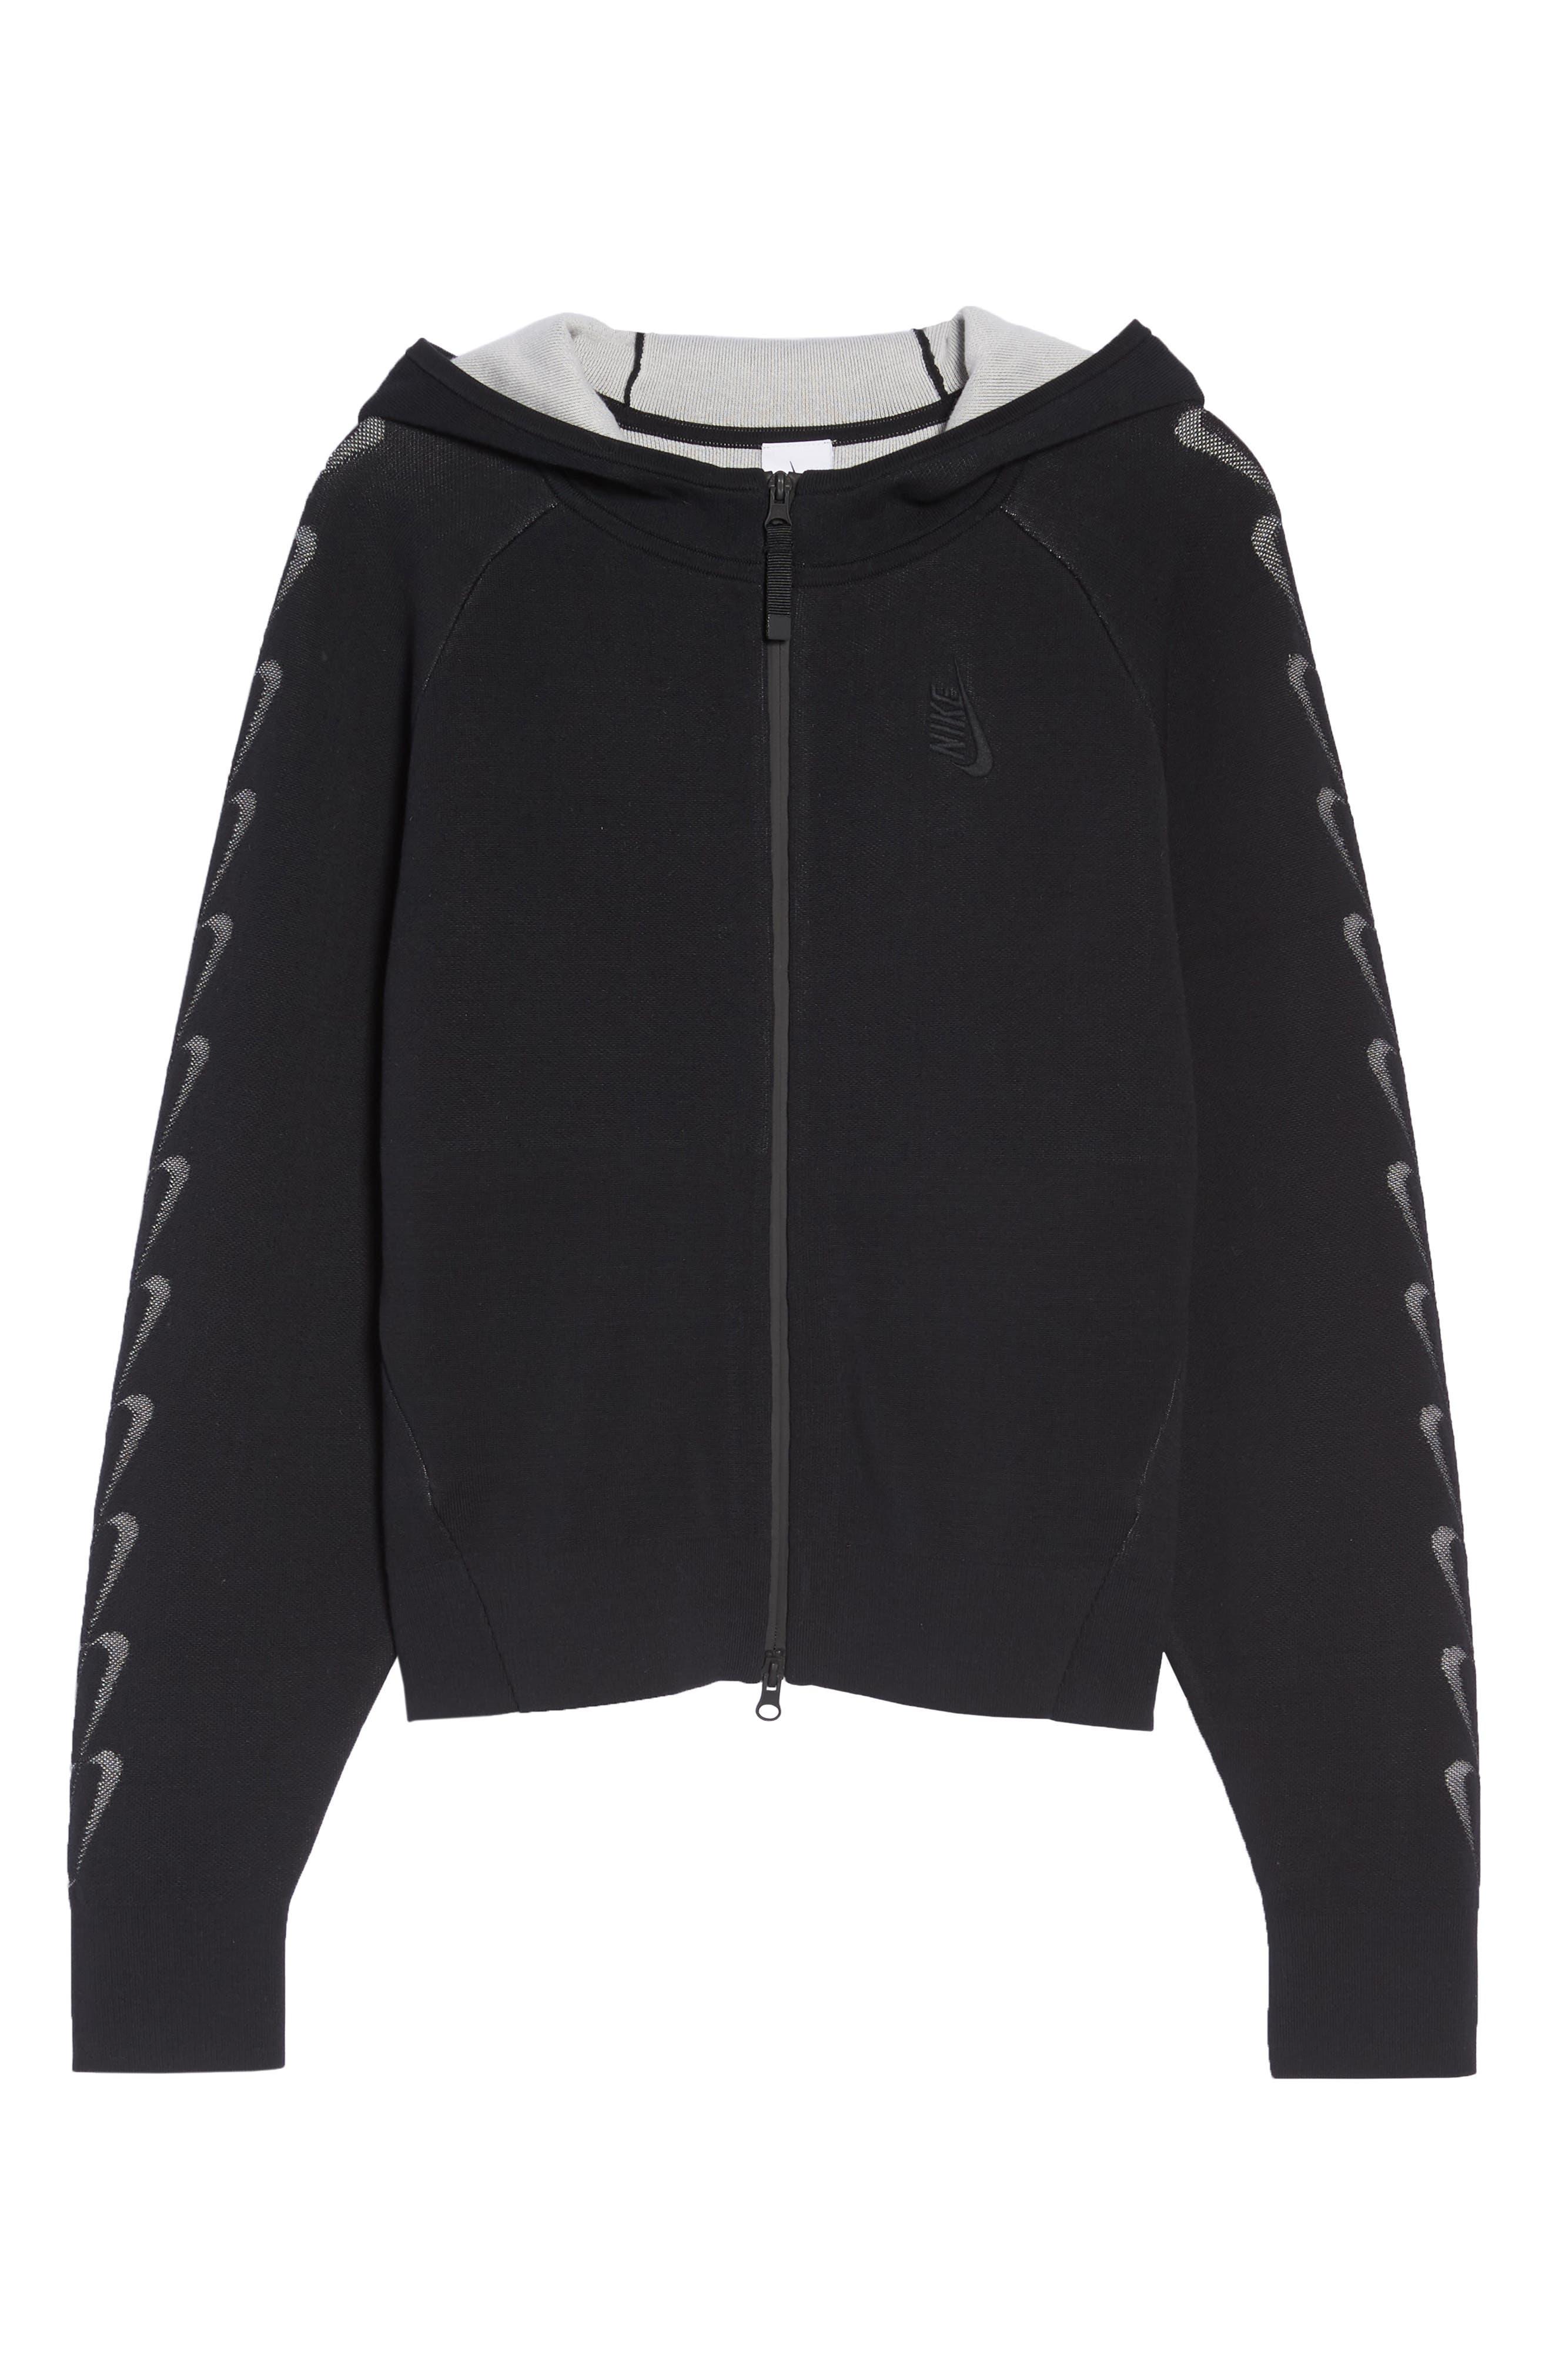 NRG Women's Knit Jacket,                             Alternate thumbnail 6, color,                             Black/ Vast Grey